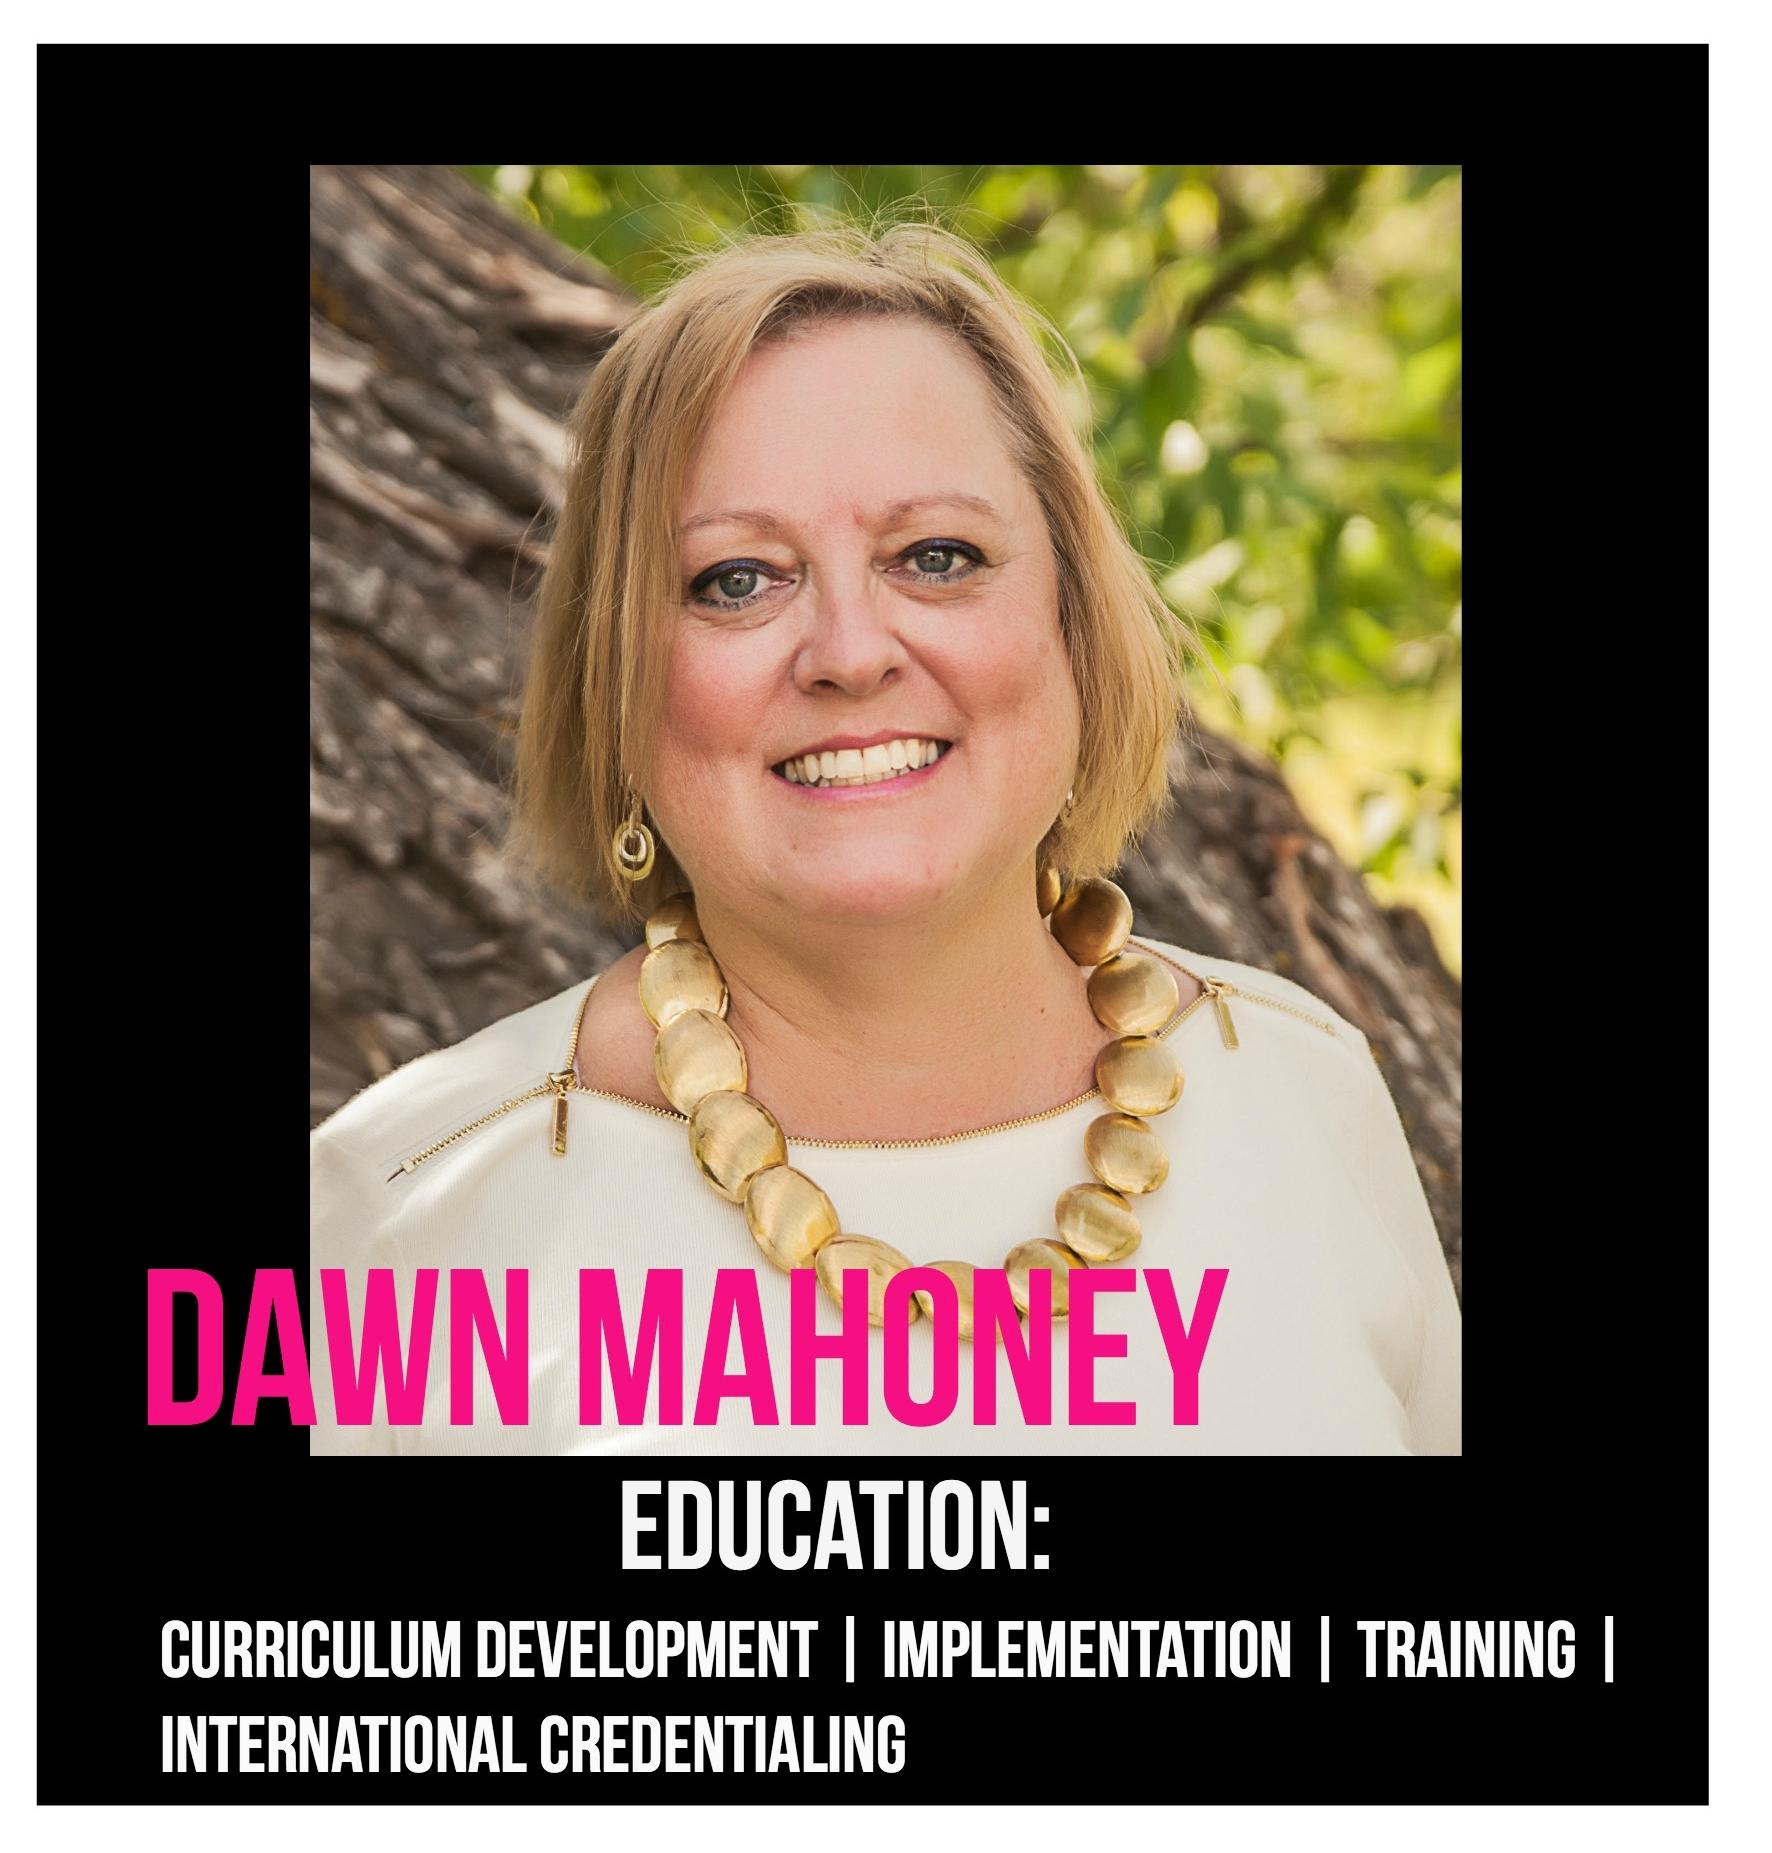 THE JILLS OF ALL TRADES™ member,  Dawn Mahoney , Education and Training